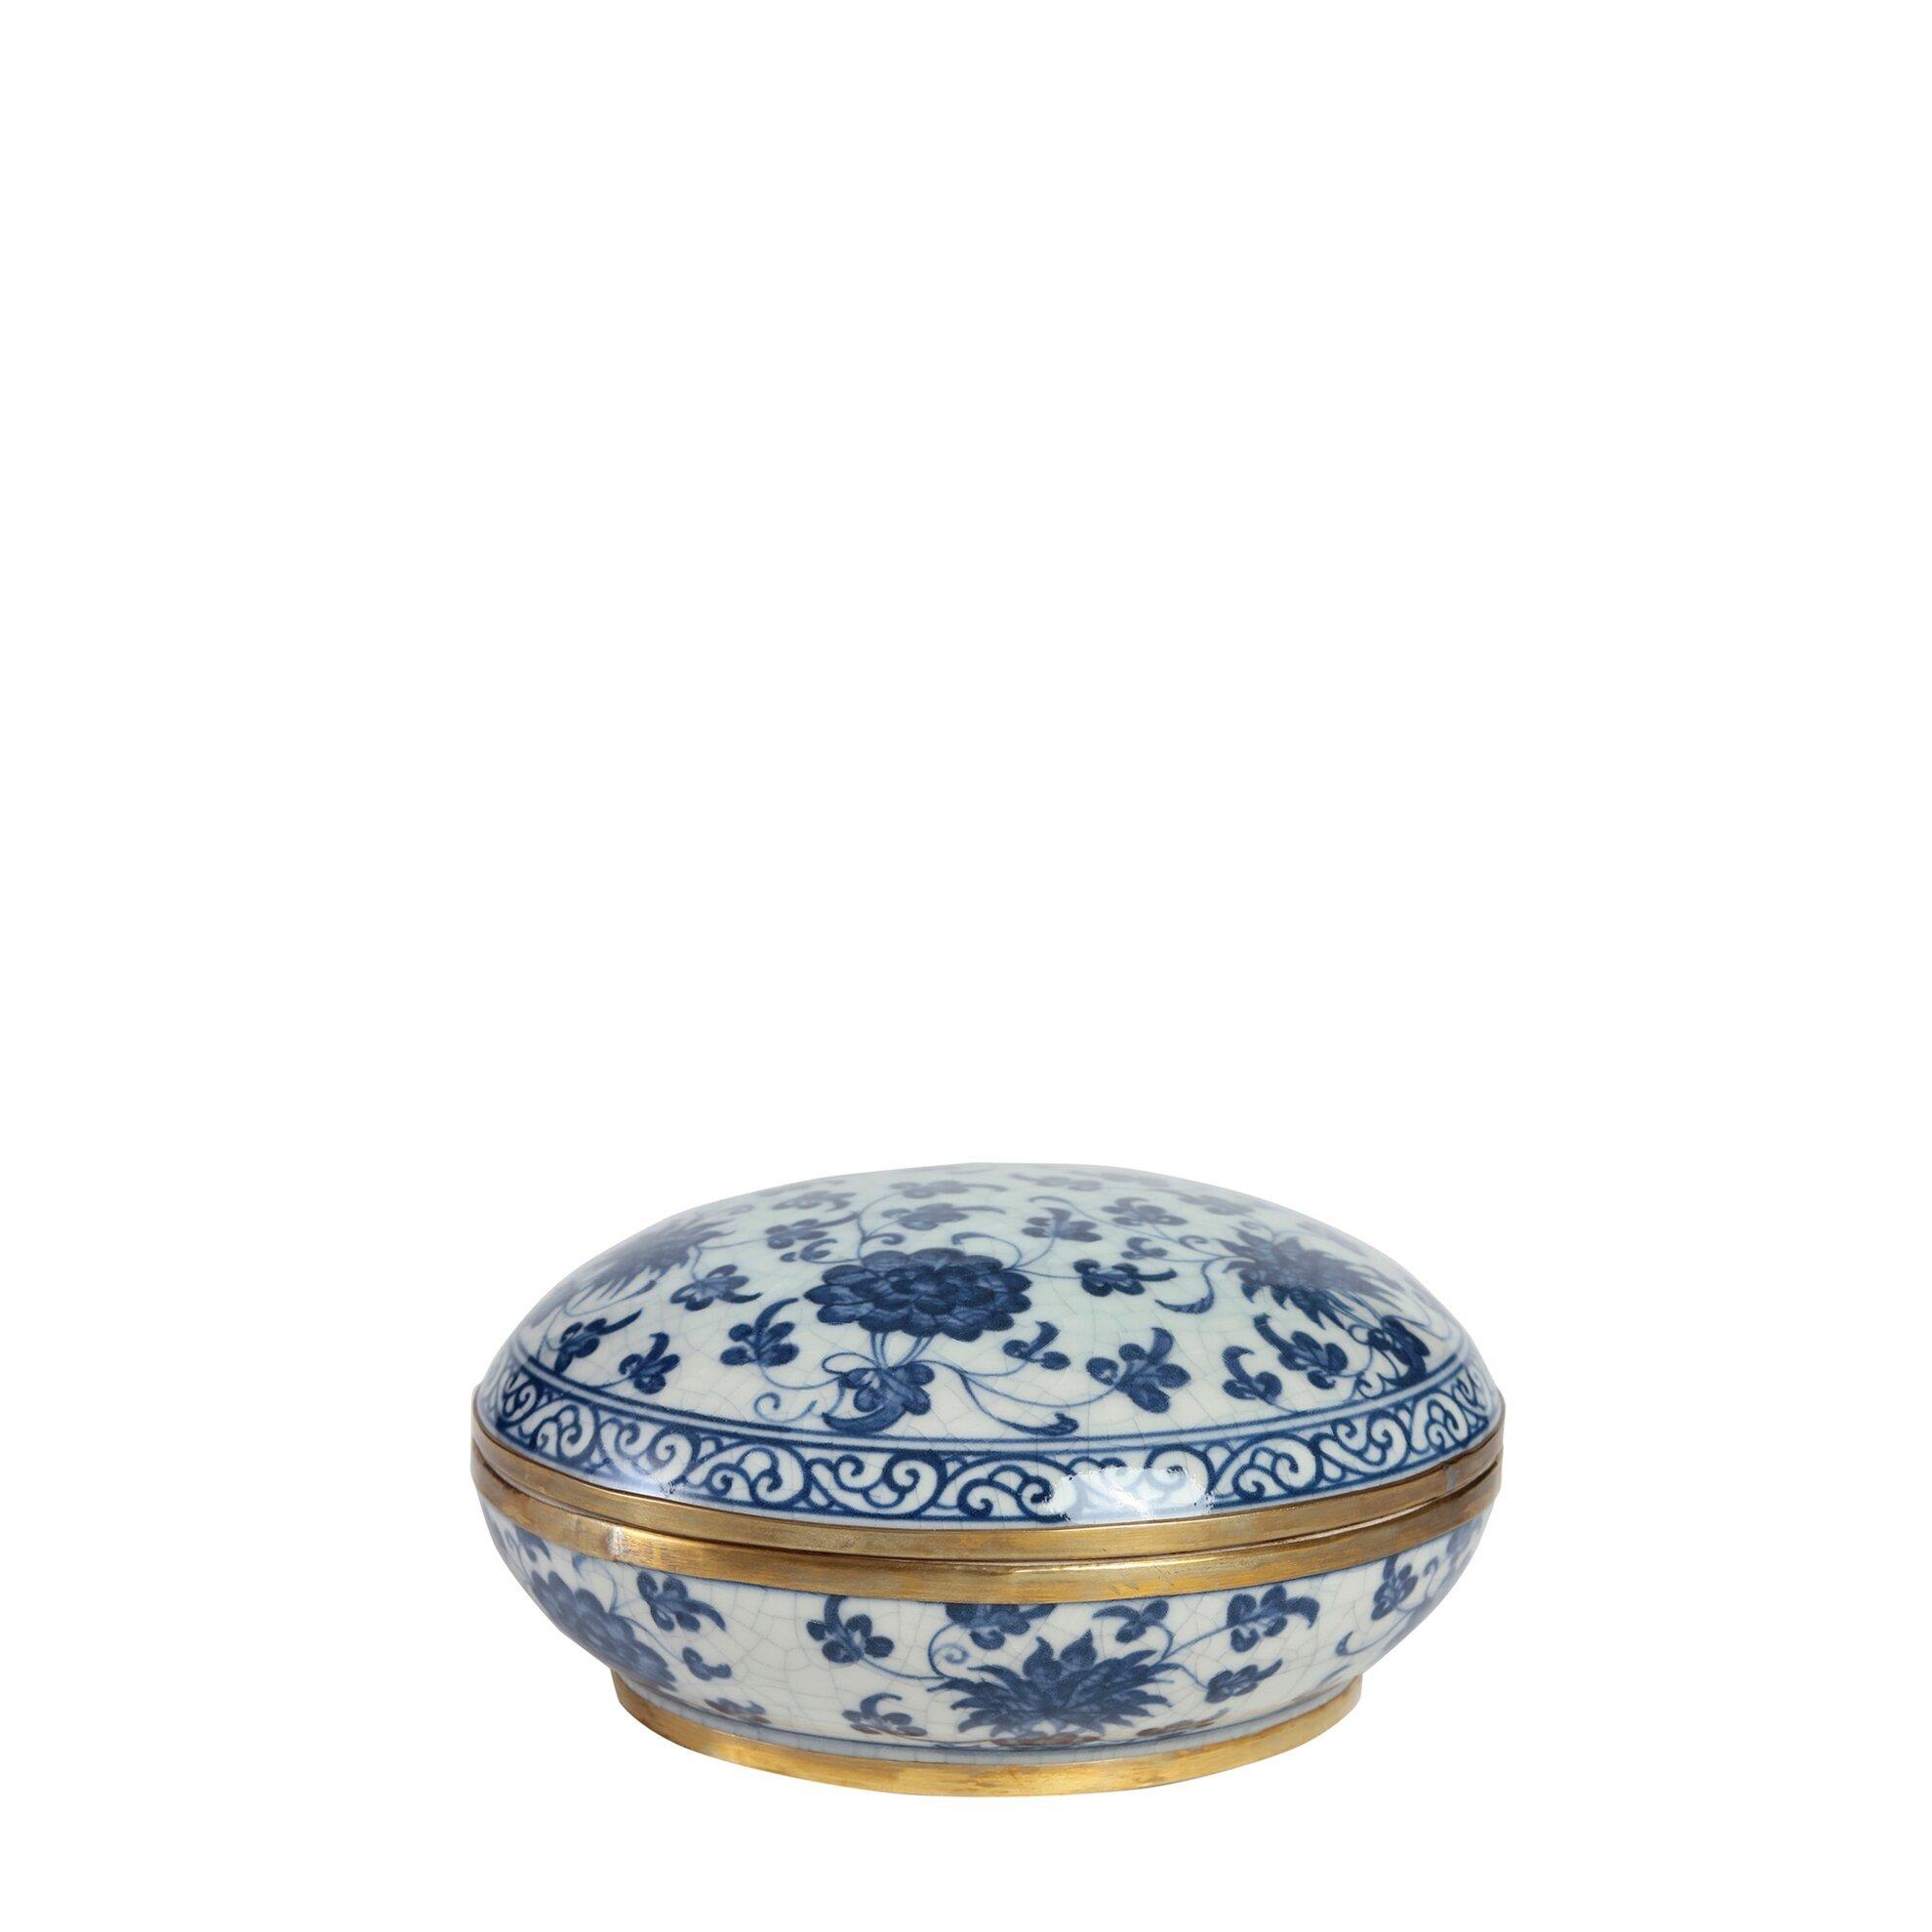 Dekoratif Obje - Bleu Blanc Kutu (17x8cm)